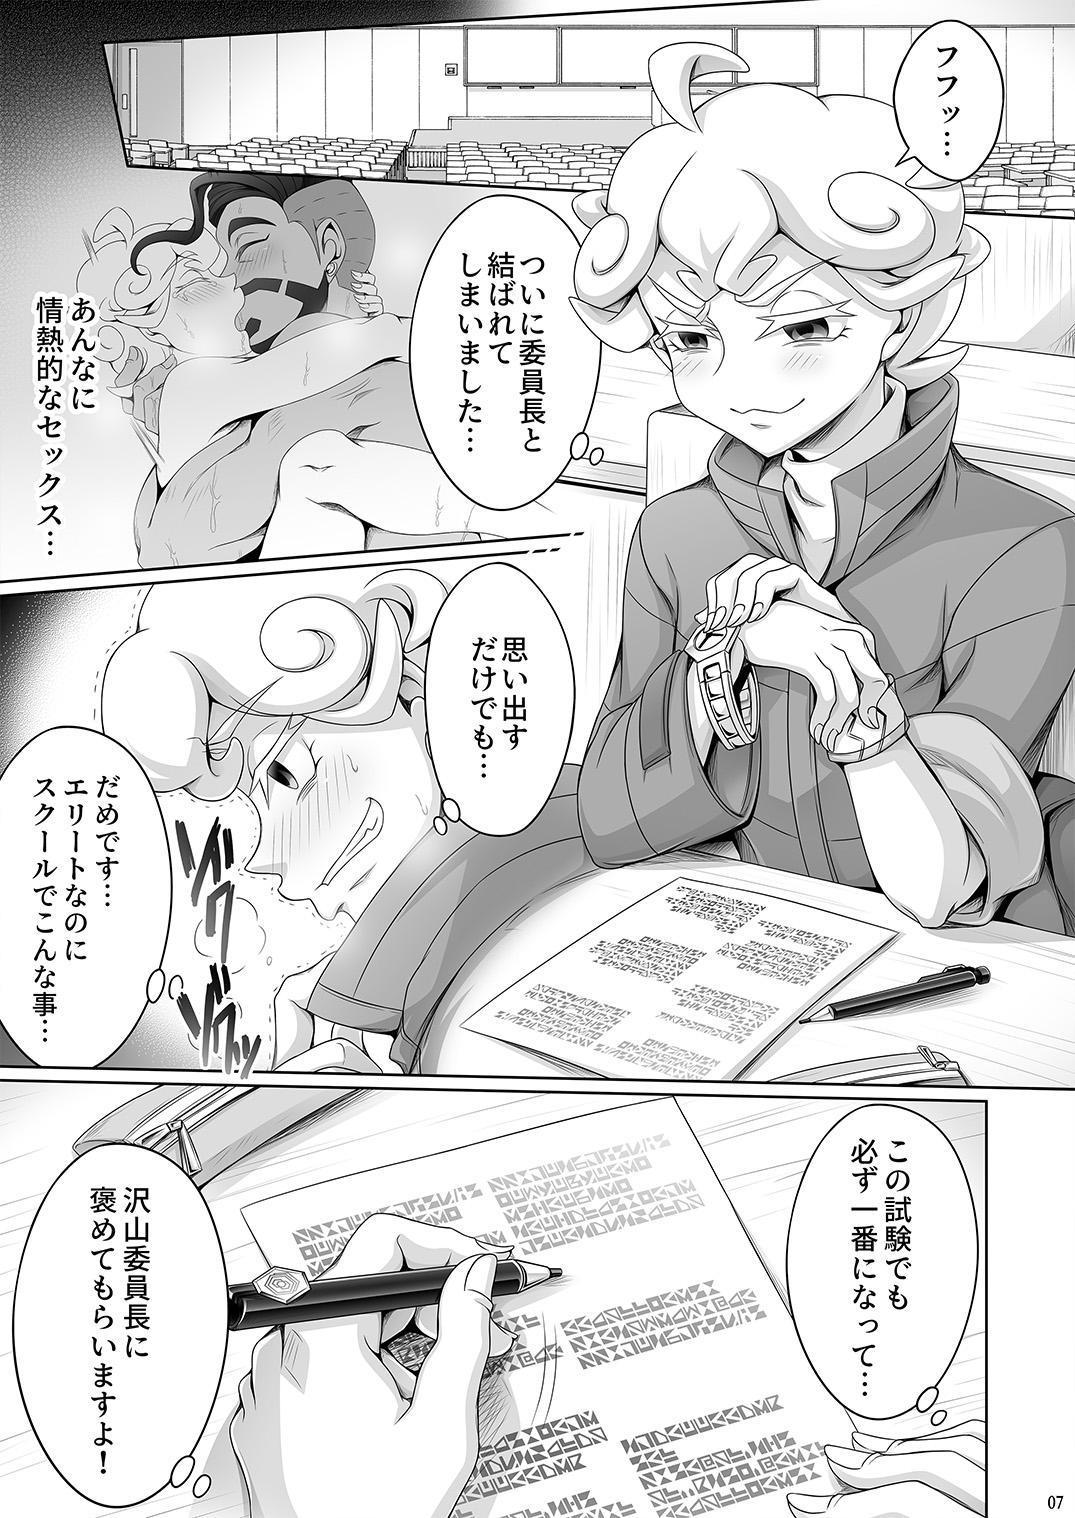 Shounen Beet no Kenshin 6